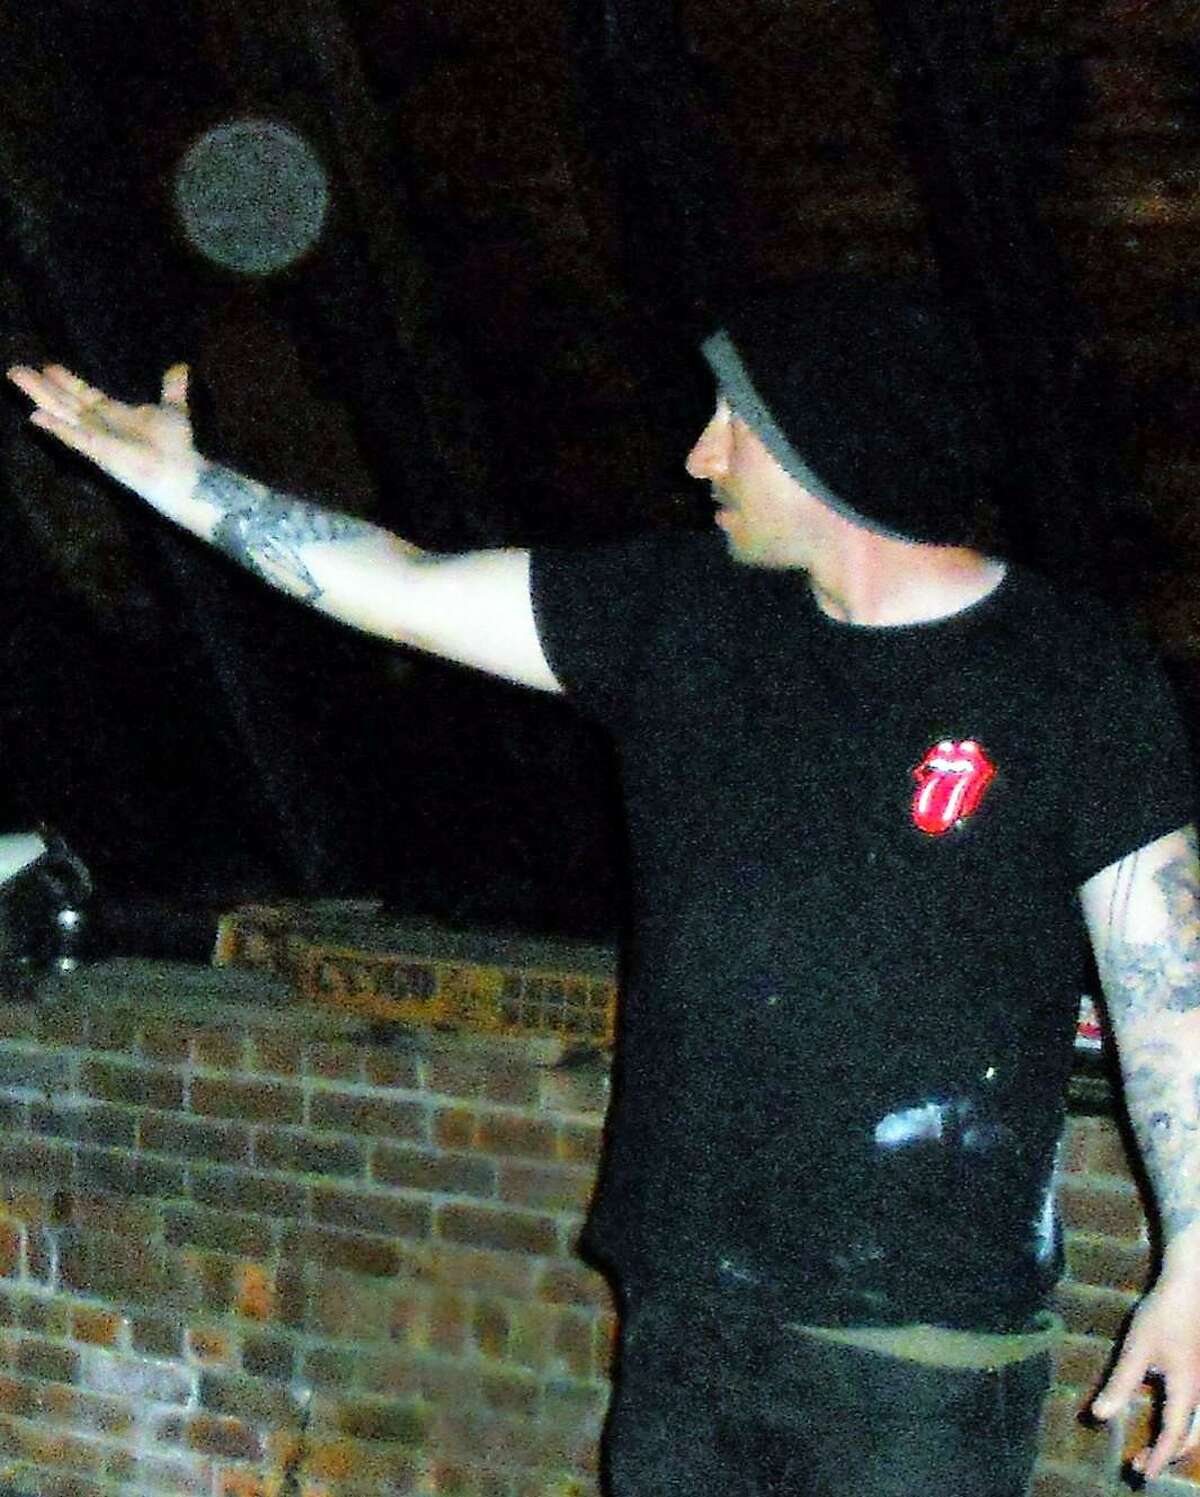 Nick Grossman investigates strange happenings at The Twisted Vine in Derby.